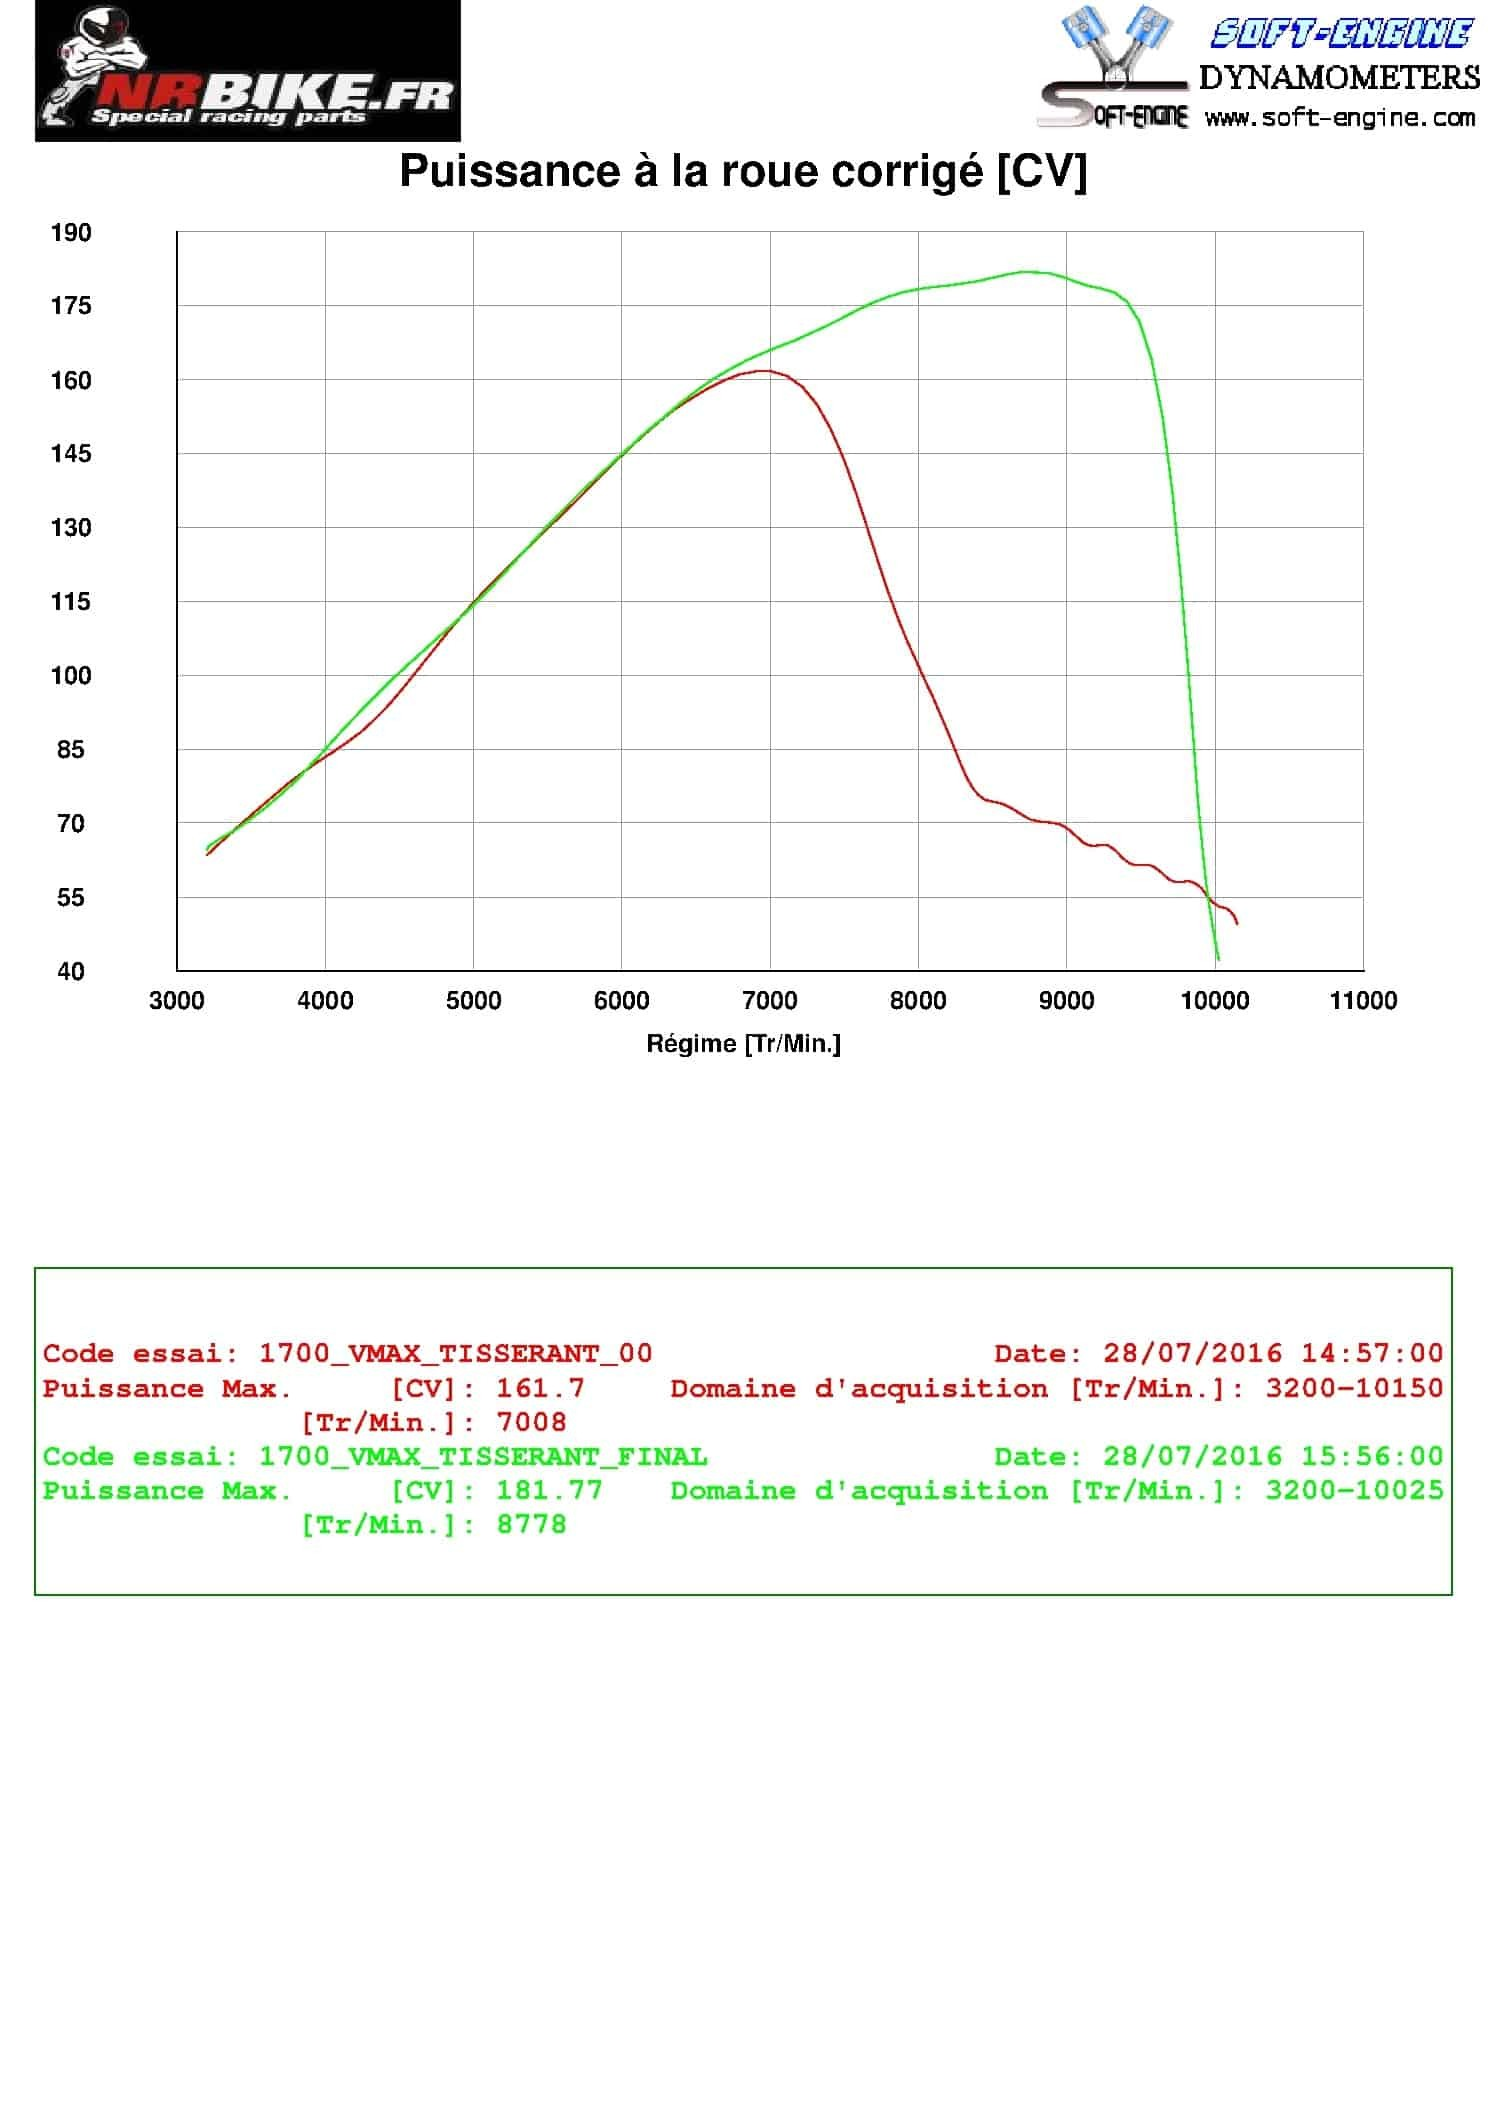 REPROGRAMMATION BOITIER ECU YAMAHA V-MAX 1700 2009 à 2016